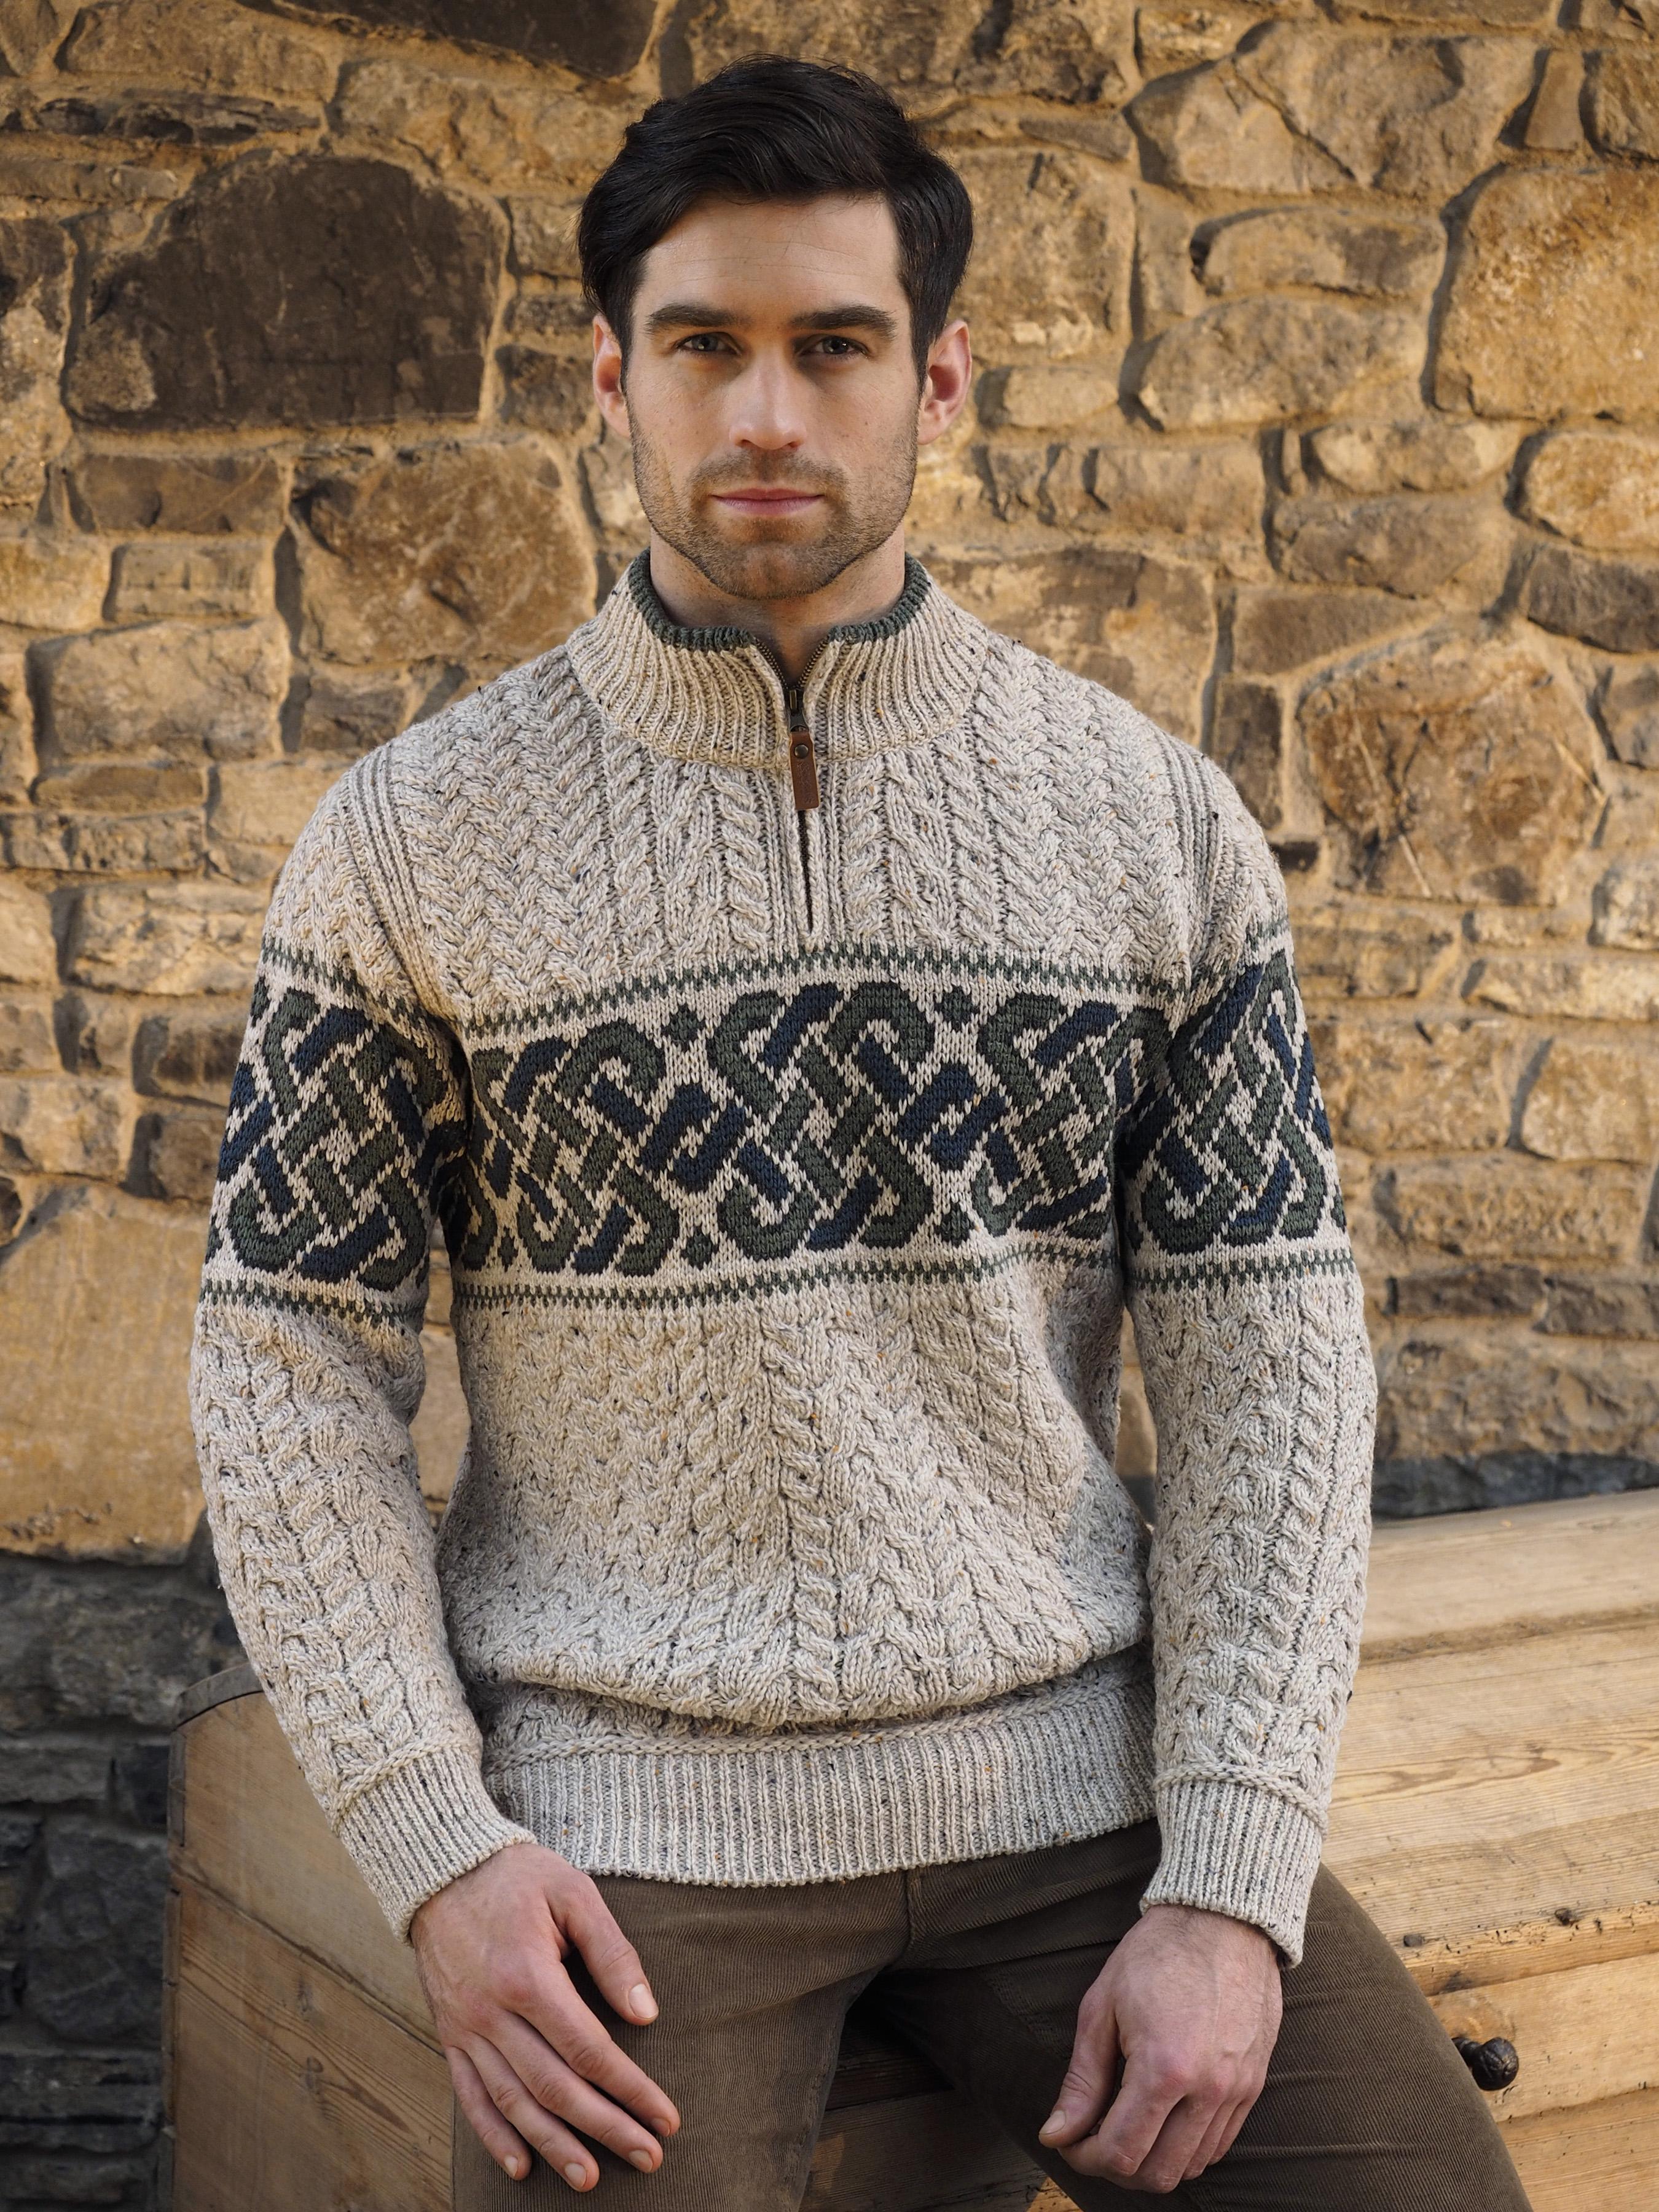 bf8c5116f620 Aran Crafts Celtic Jacquard Sweater - West End Knitwear